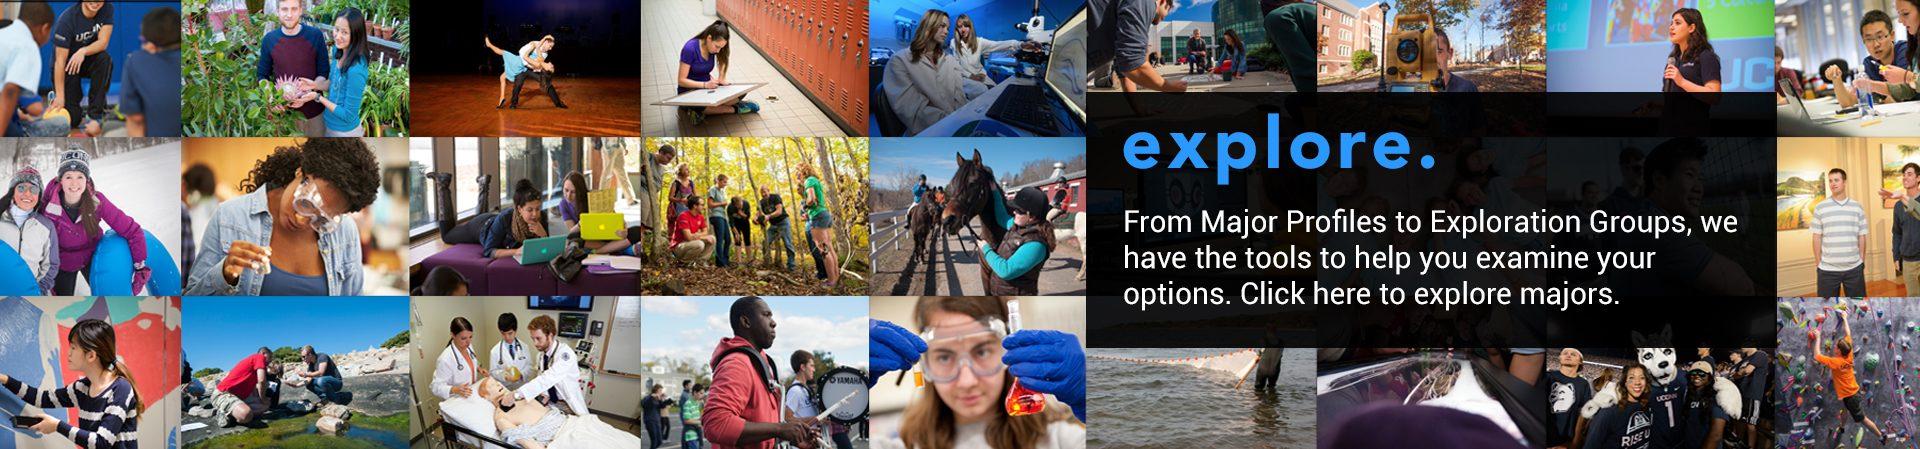 explore majors